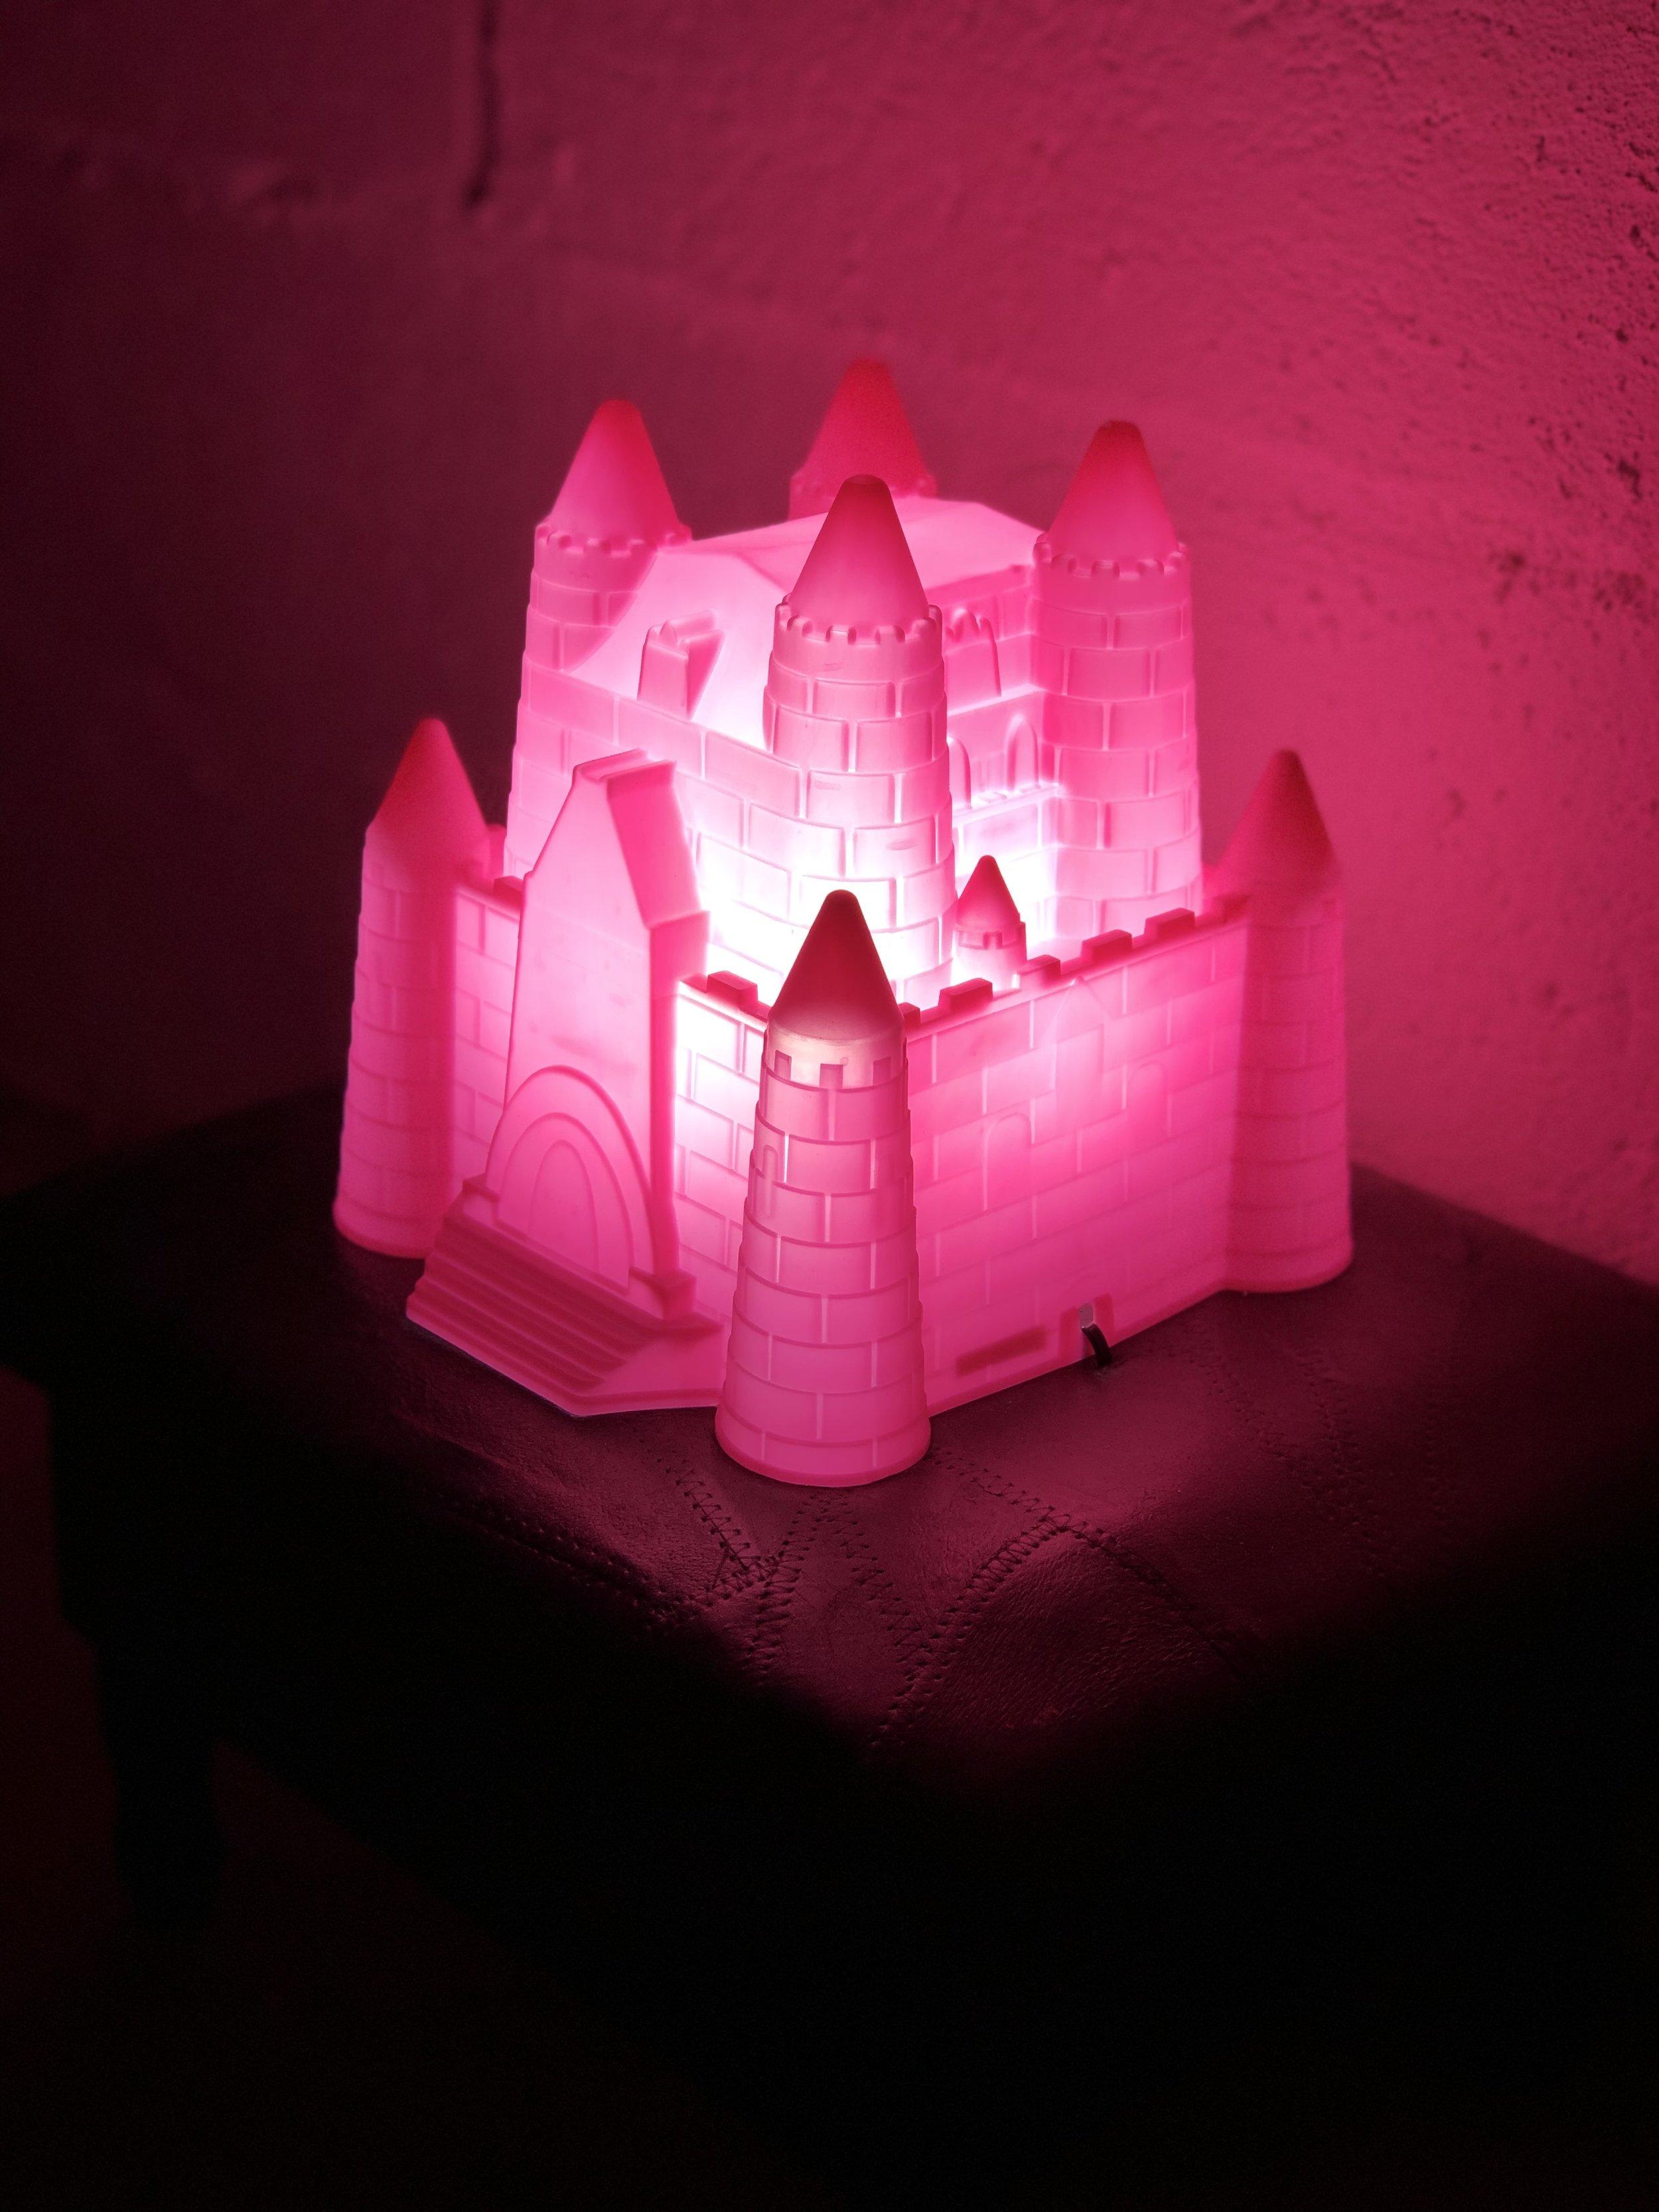 Pink Castle_1 by Nick Gordon.jpg